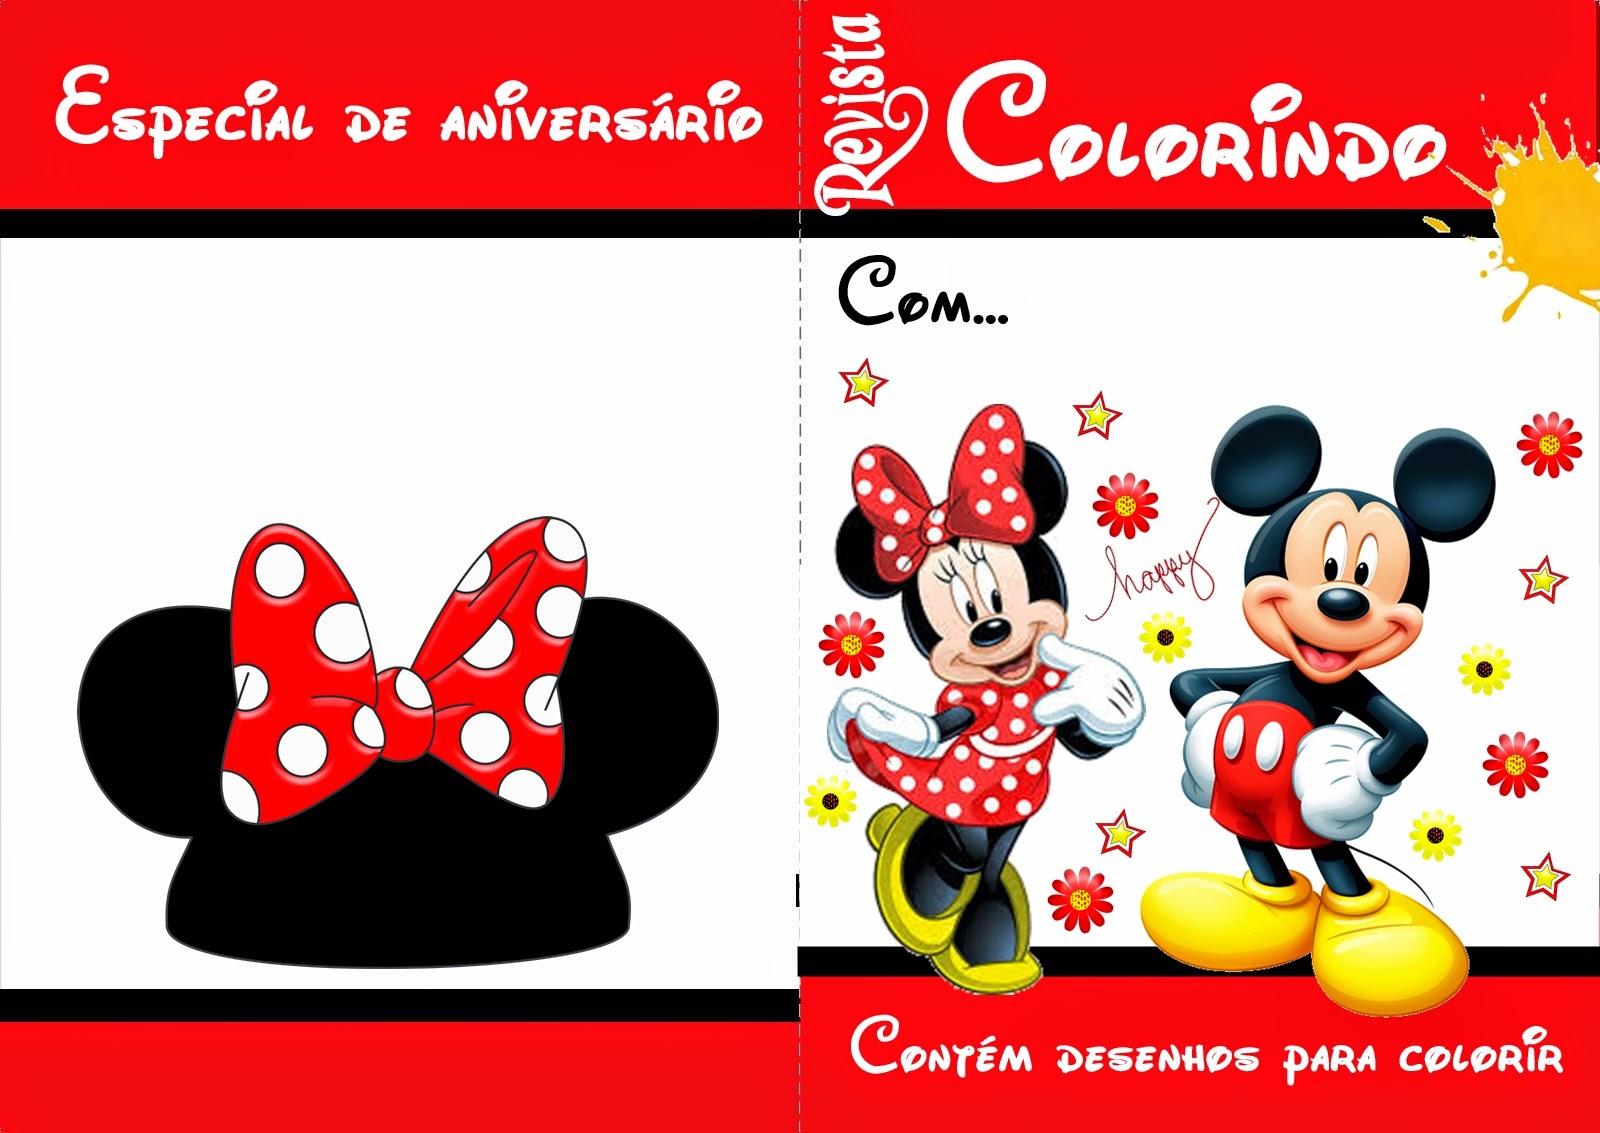 kit de colorir do mickey ou minnie no elo7 cri cri brindes 64fb41